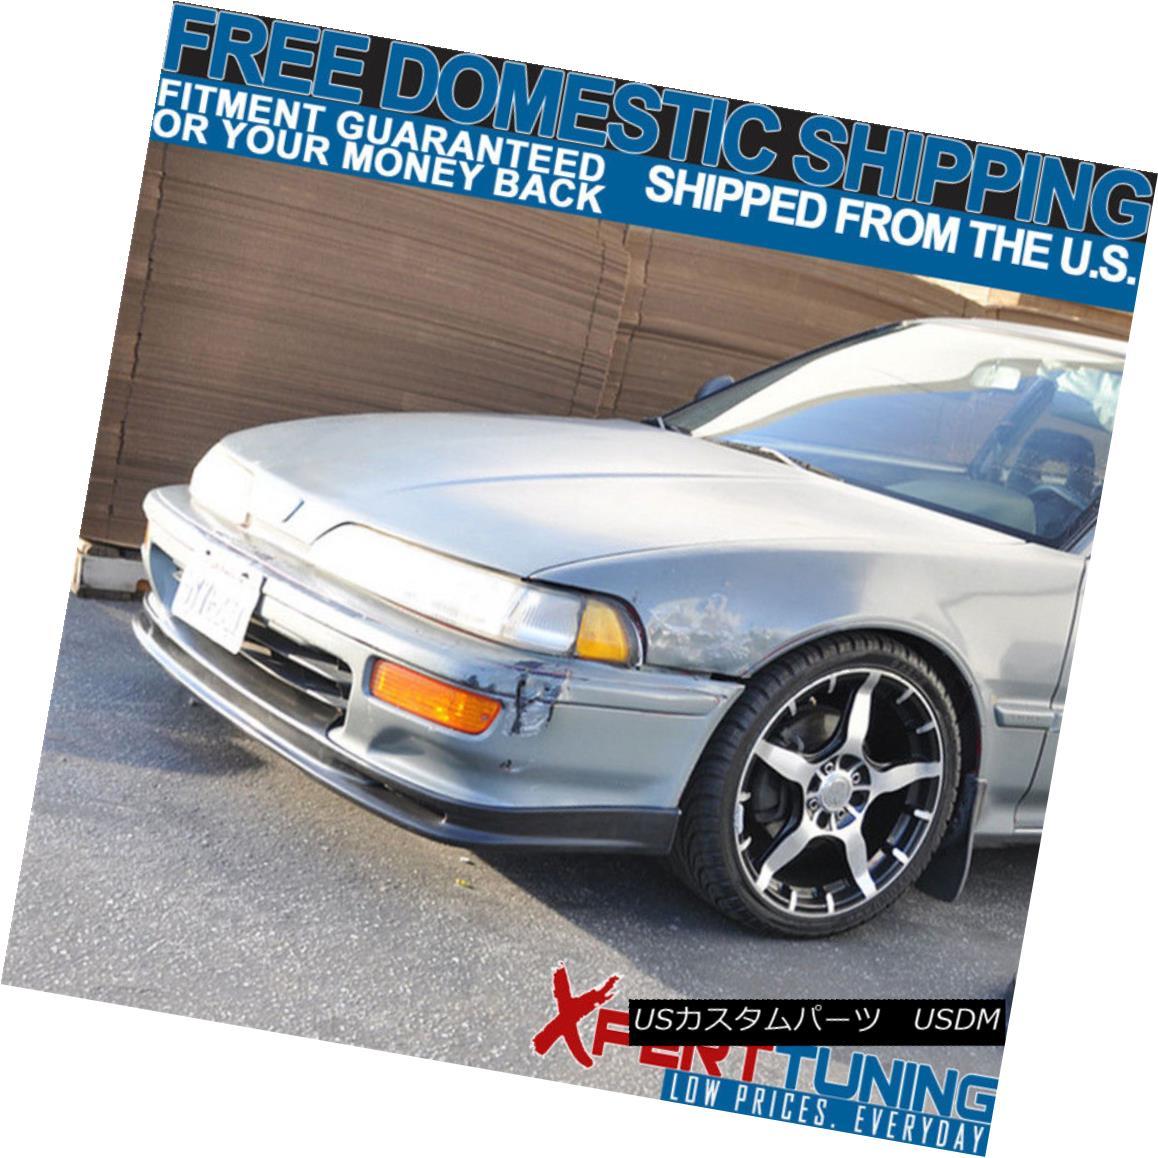 92-93 Acura Integra MUG Style Urethane Add-On Front Bumper Lip Spoiler Bodykit